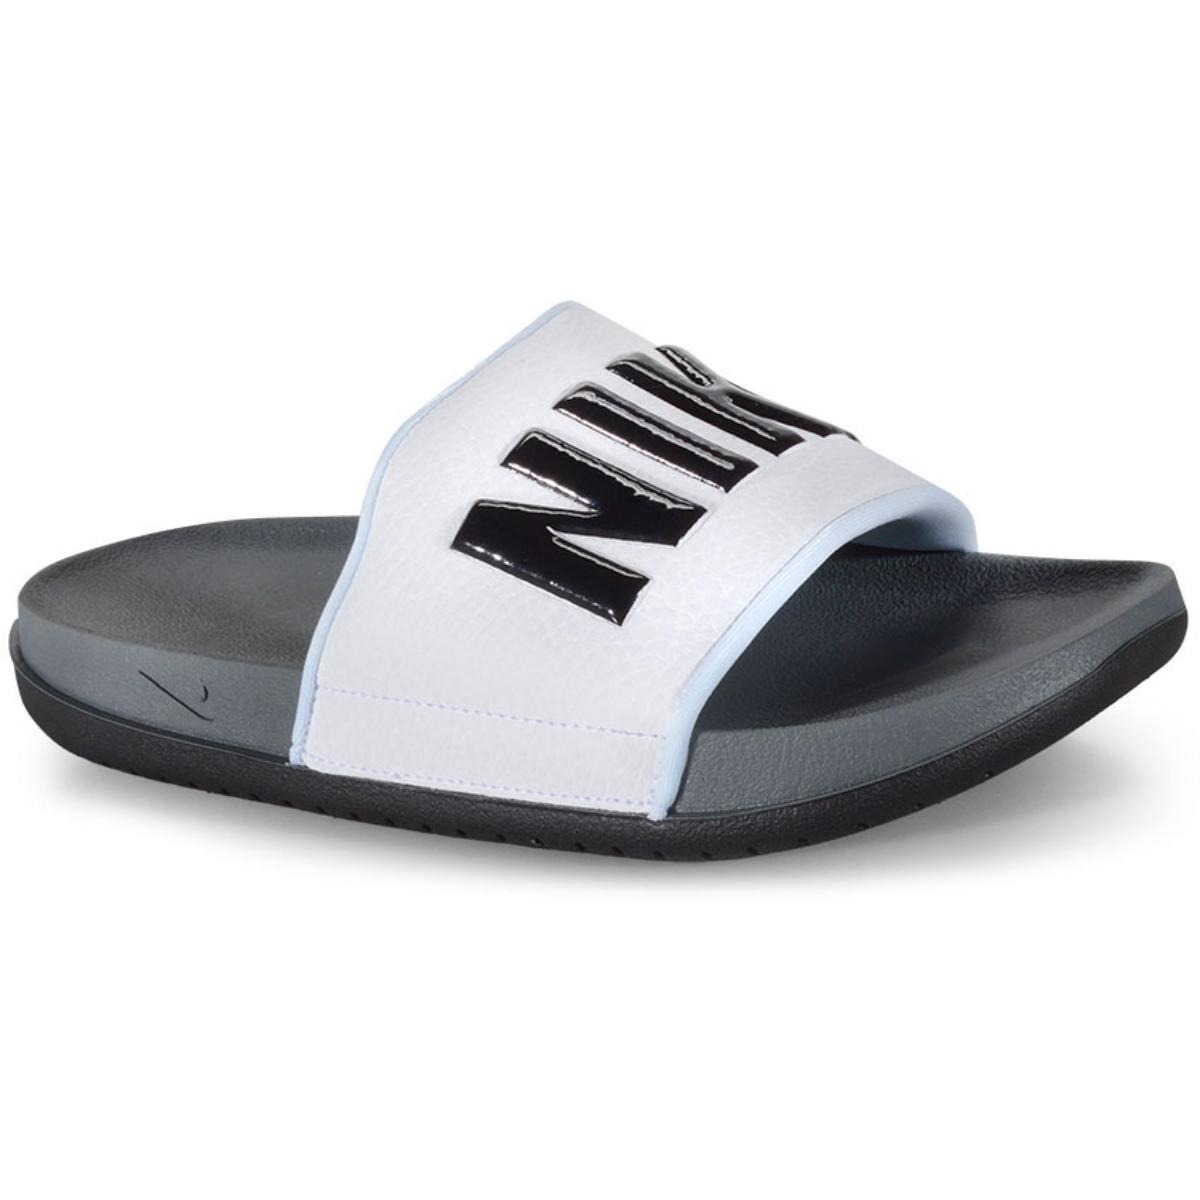 Chinelo Masculino Nike Bq4639-001 Offcourt Slide Branco/preto